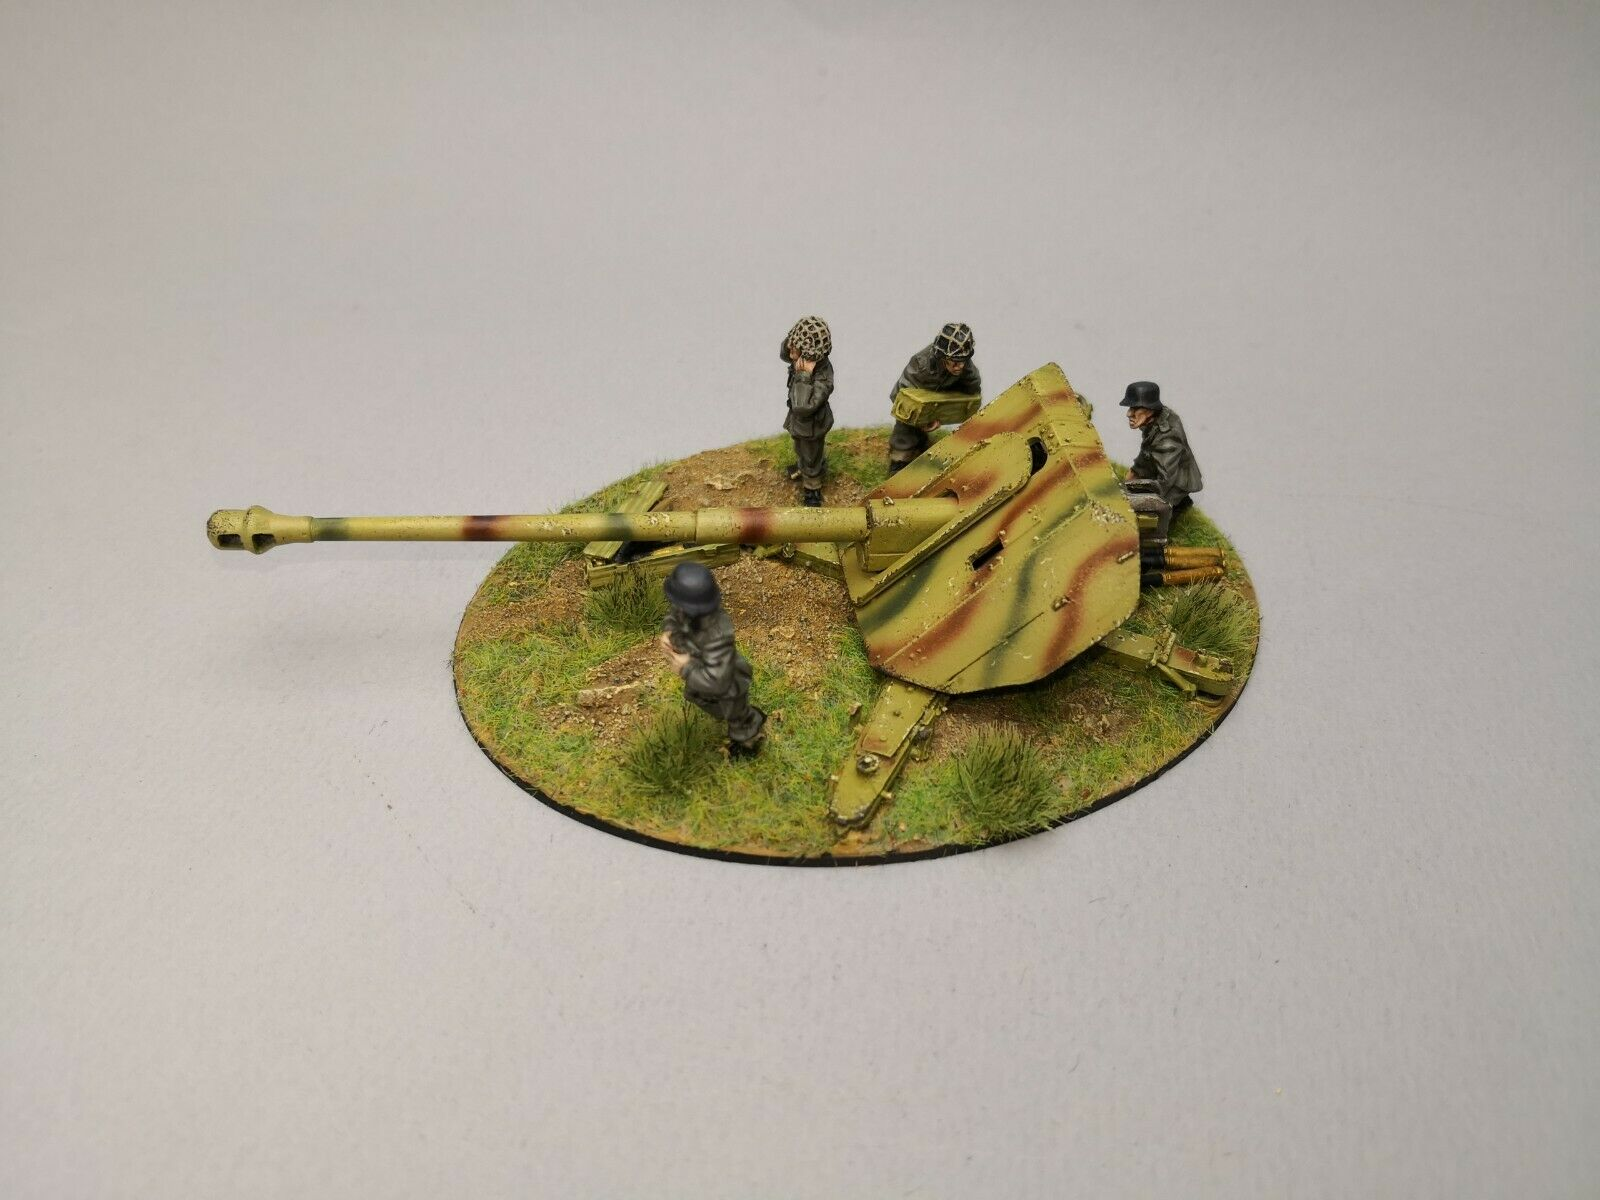 Geruomo 8mm PaK 43 Heavy Anti-tank gun WW2 28mm Bolt azione Pro Painted